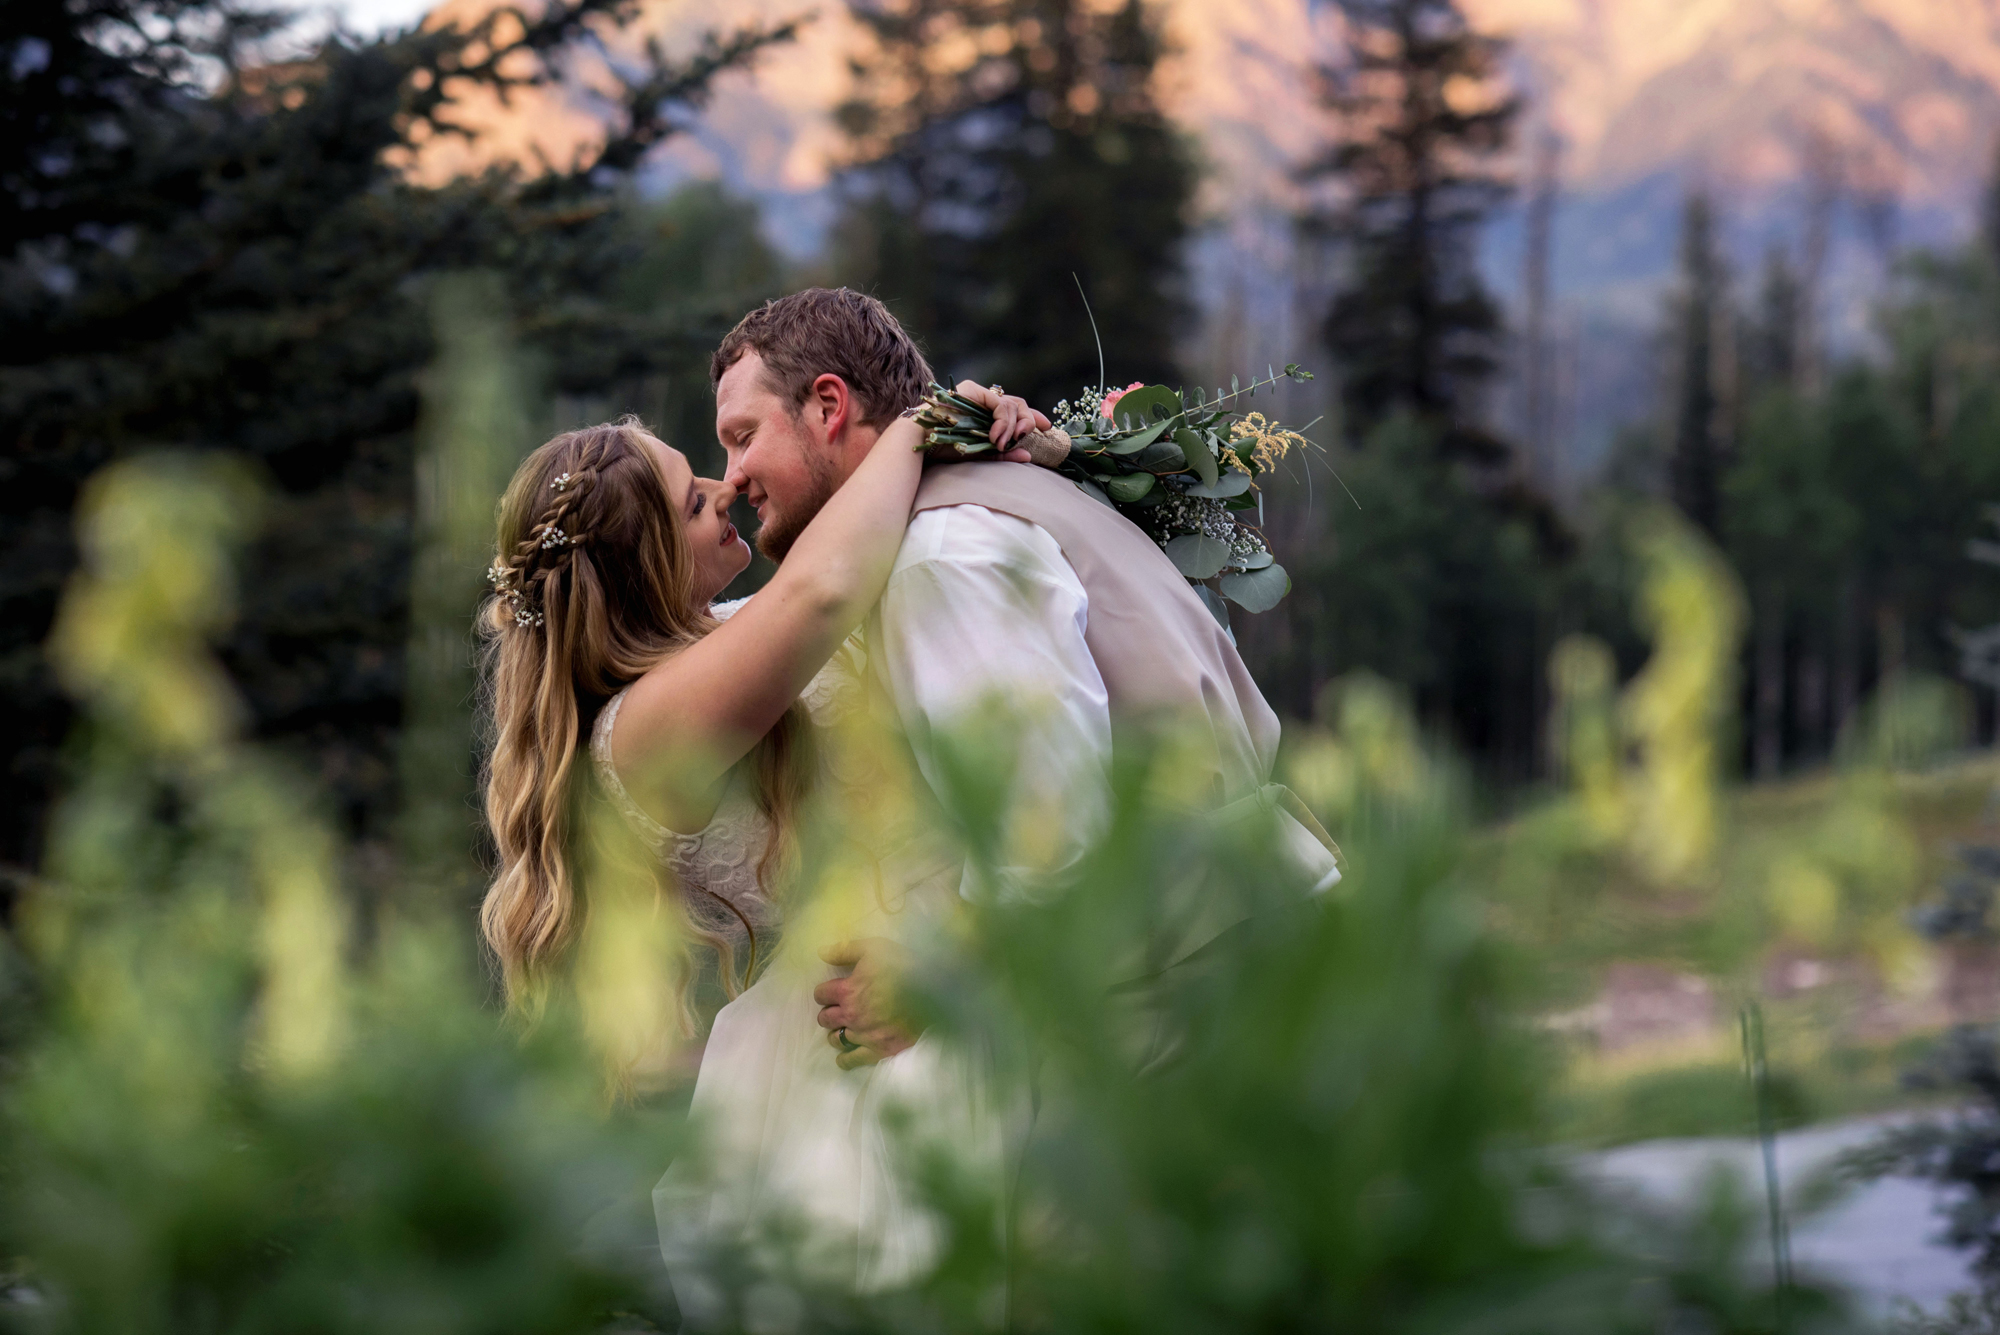 Cascade Village Wedding by Tara Vigil, Durango, CO